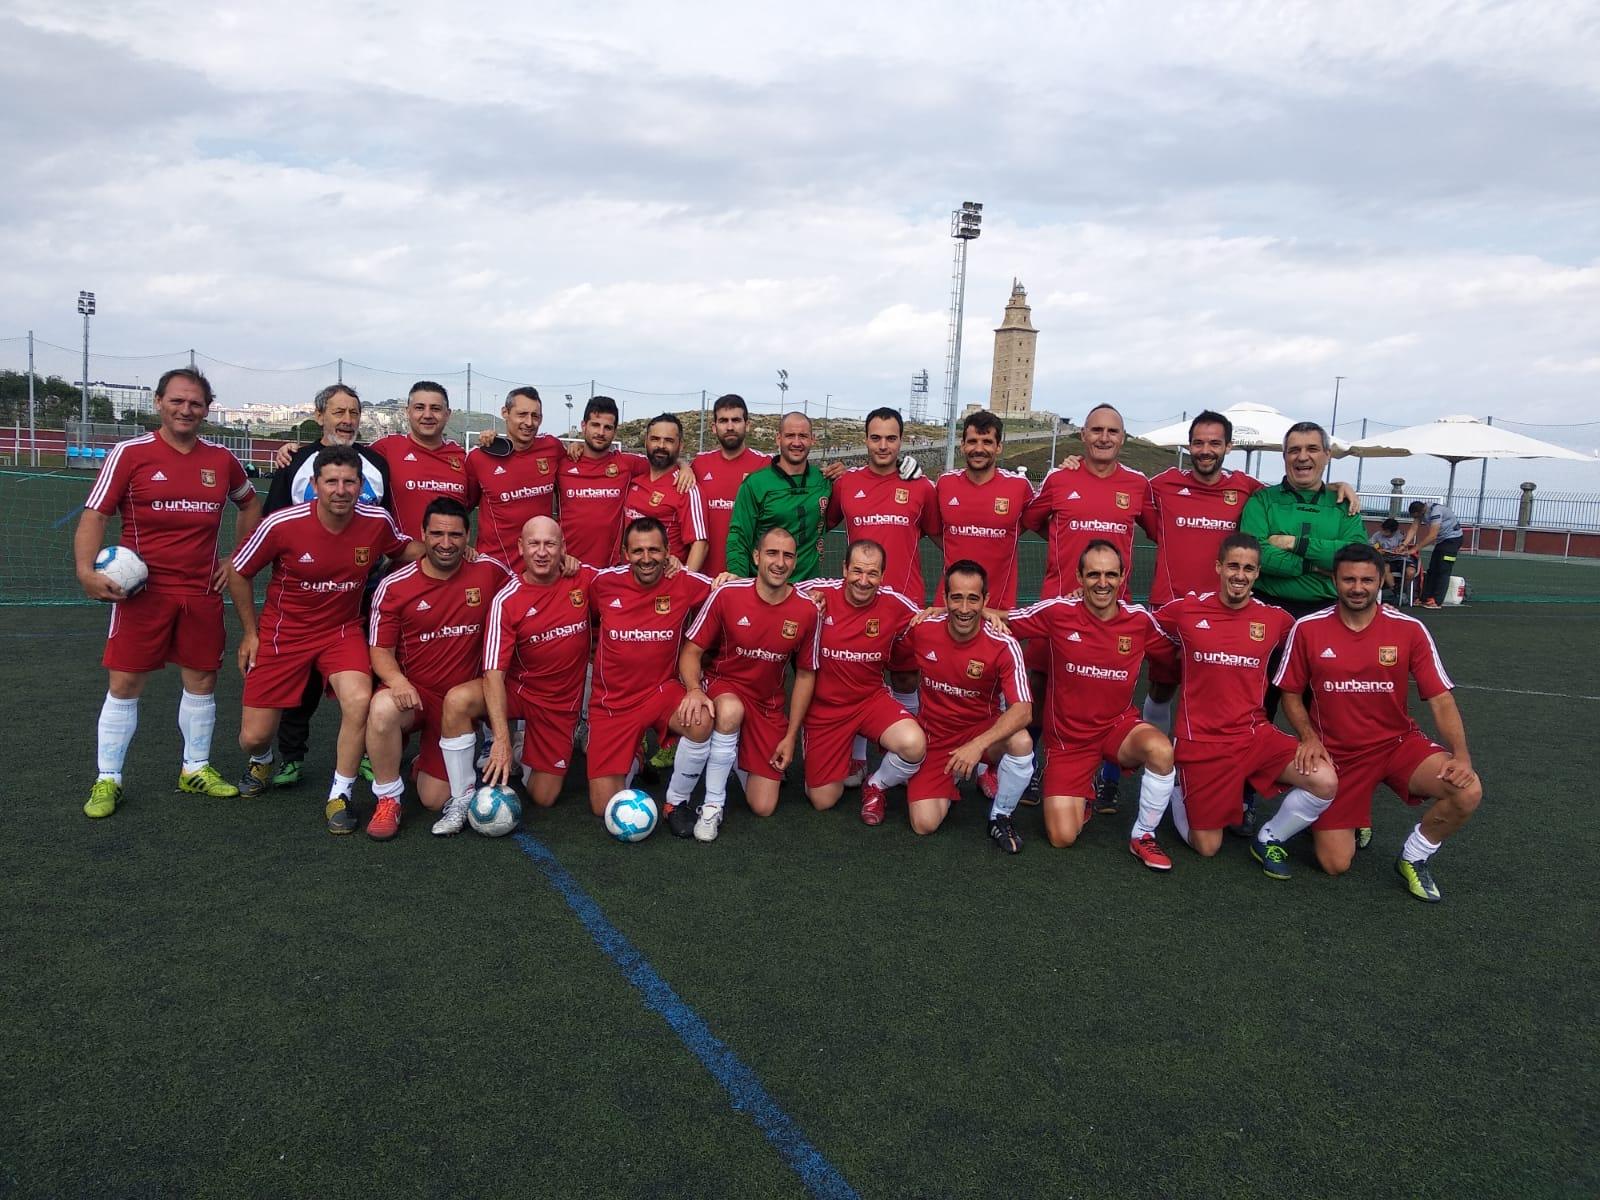 campeonato-futbol7-2019-equipo